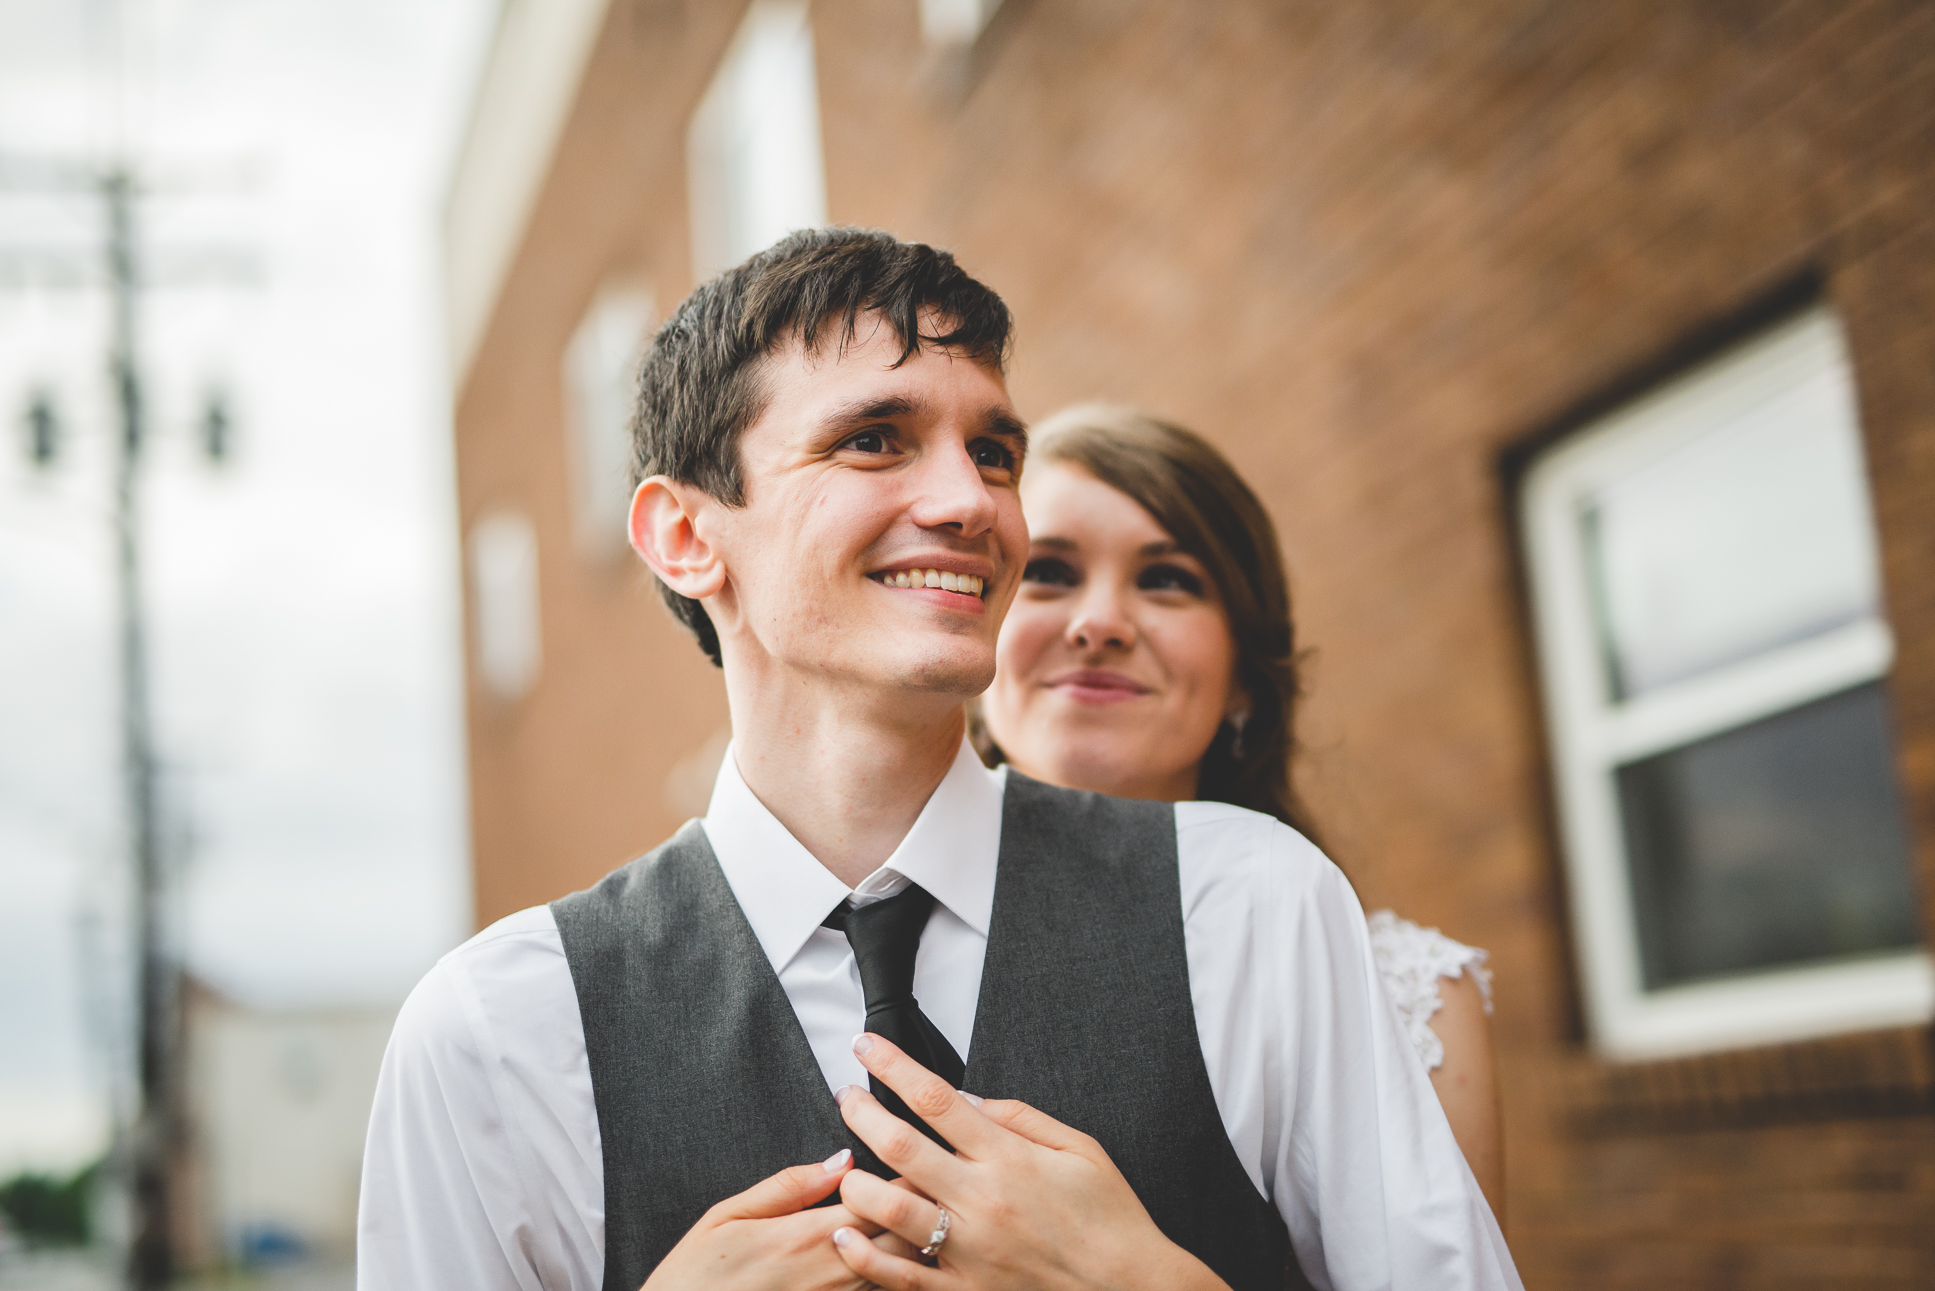 Emily & Evan Wedding - Dustin Morrison Photography-189.jpg